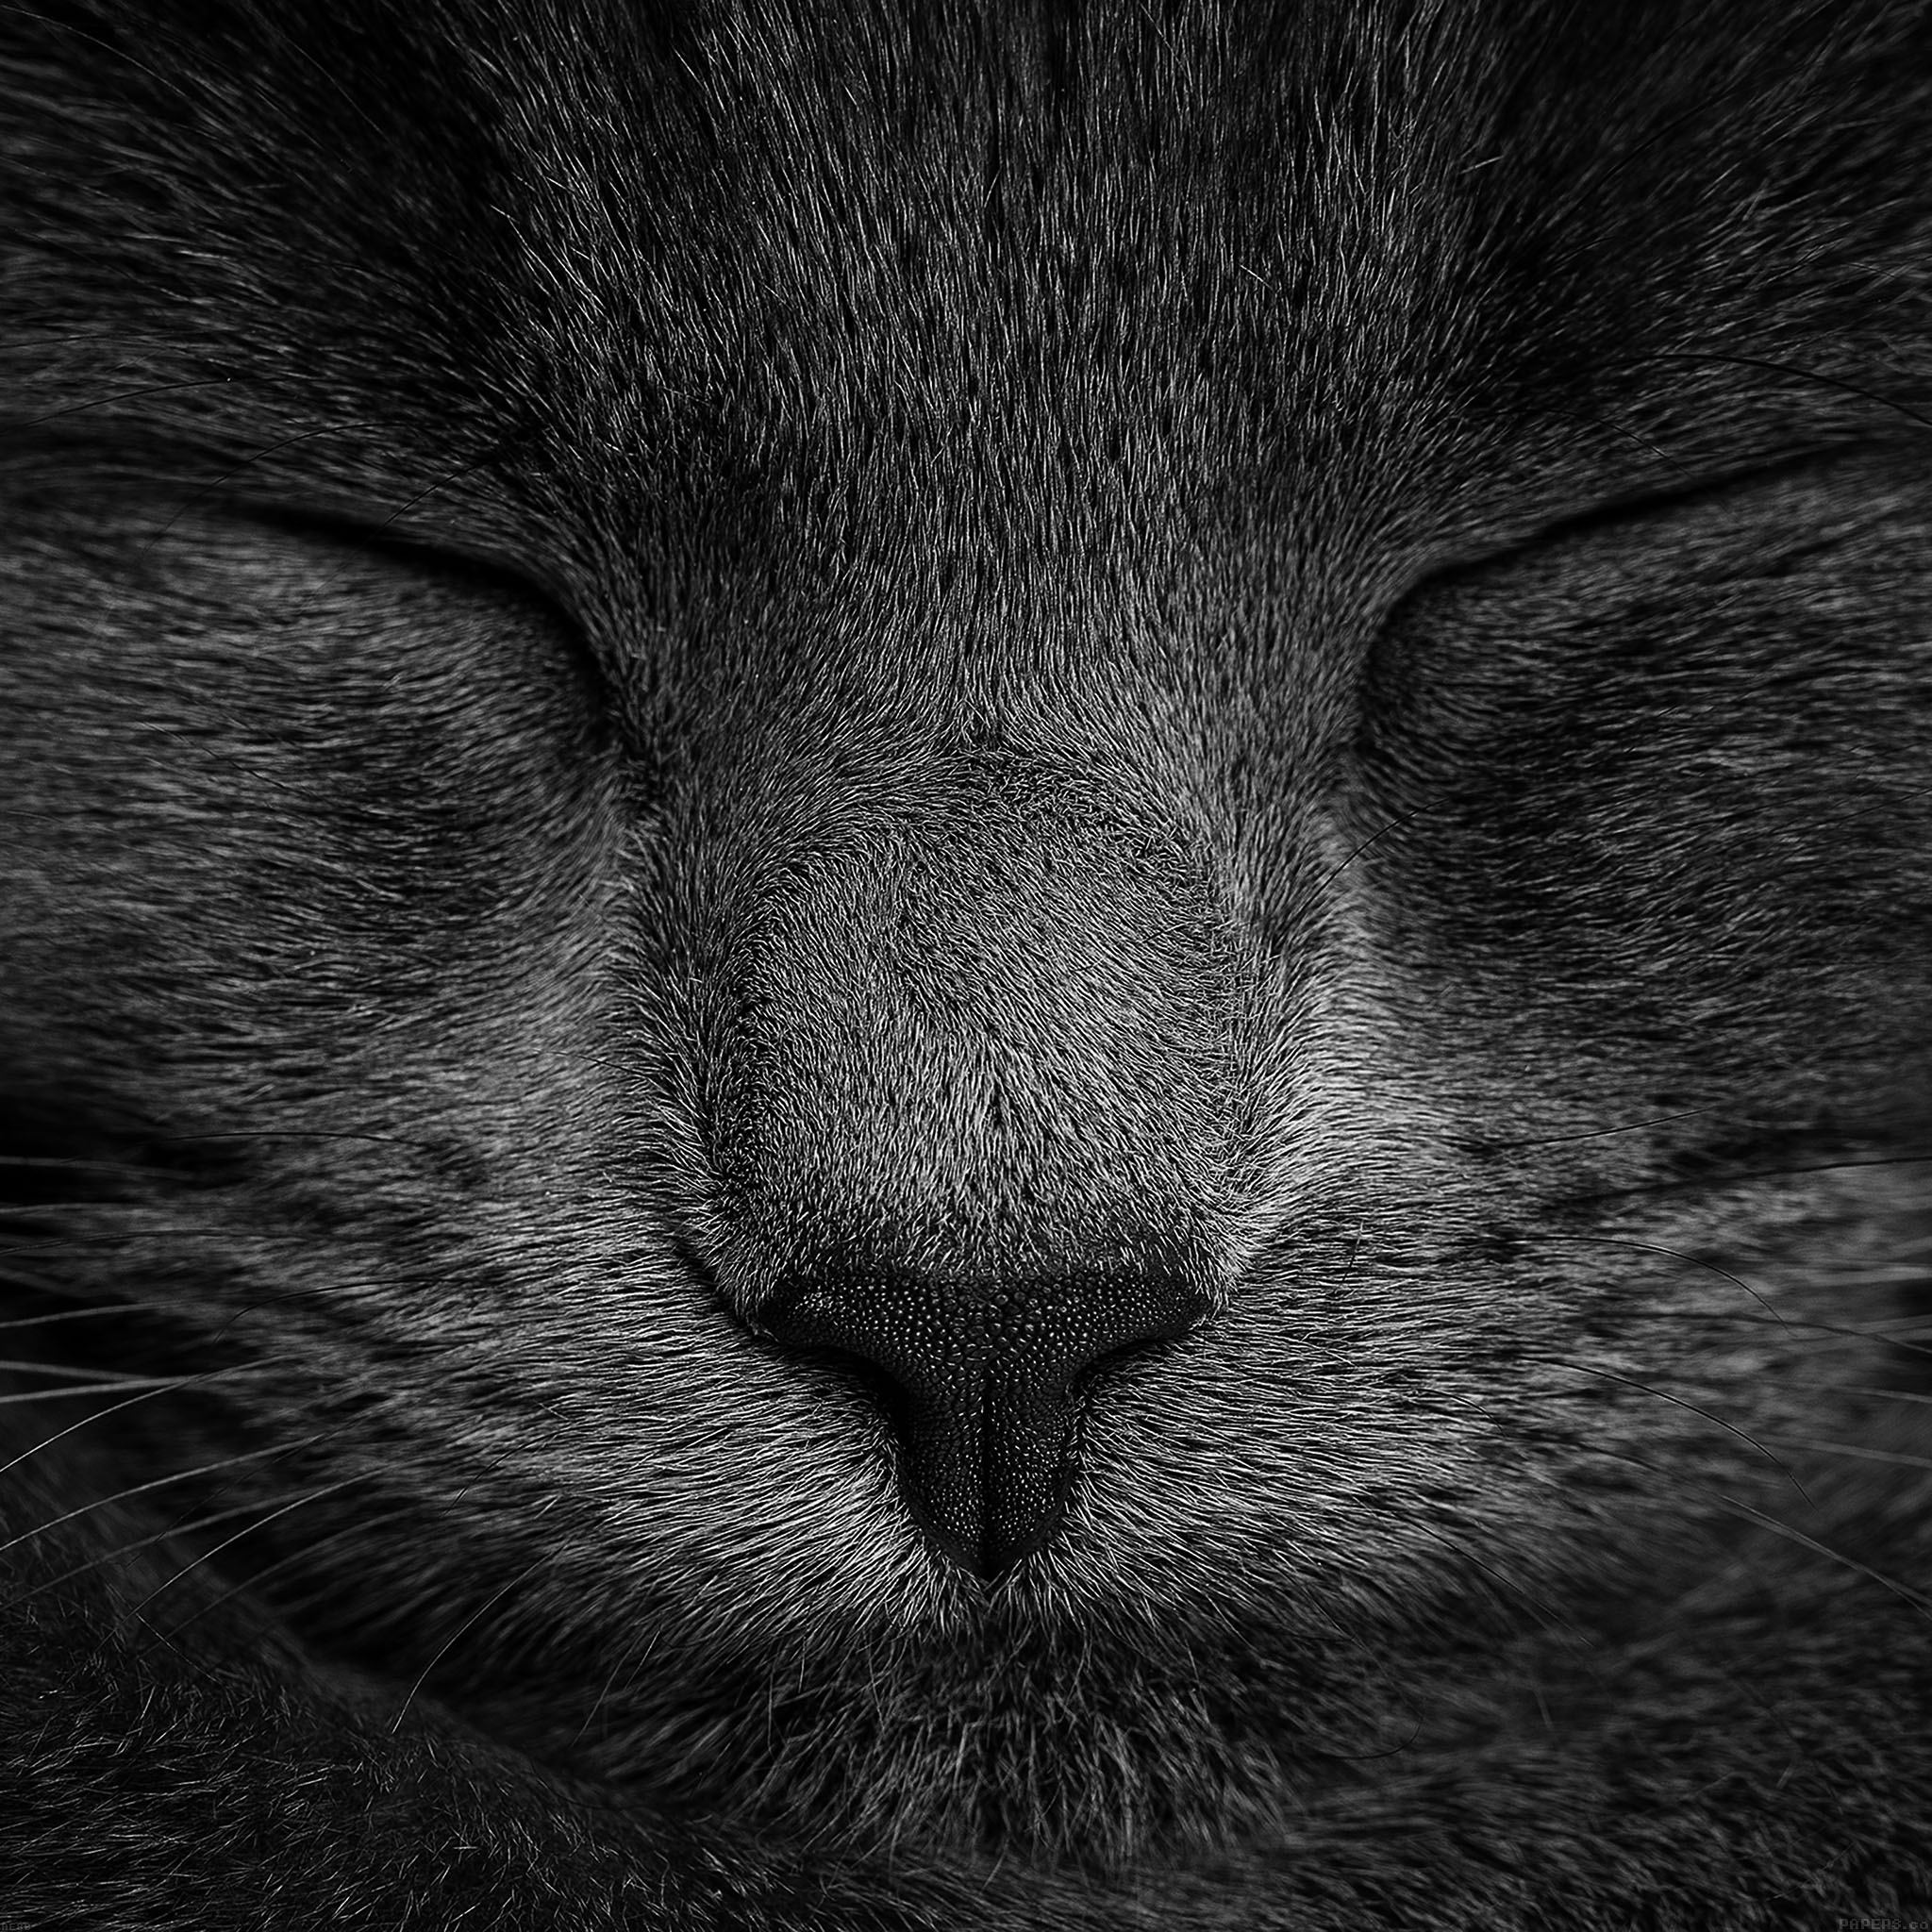 Apple Logo Wallpaper Iphone 4 Ae80 Sleeping Black Cat Zoom Nature Wallpaper